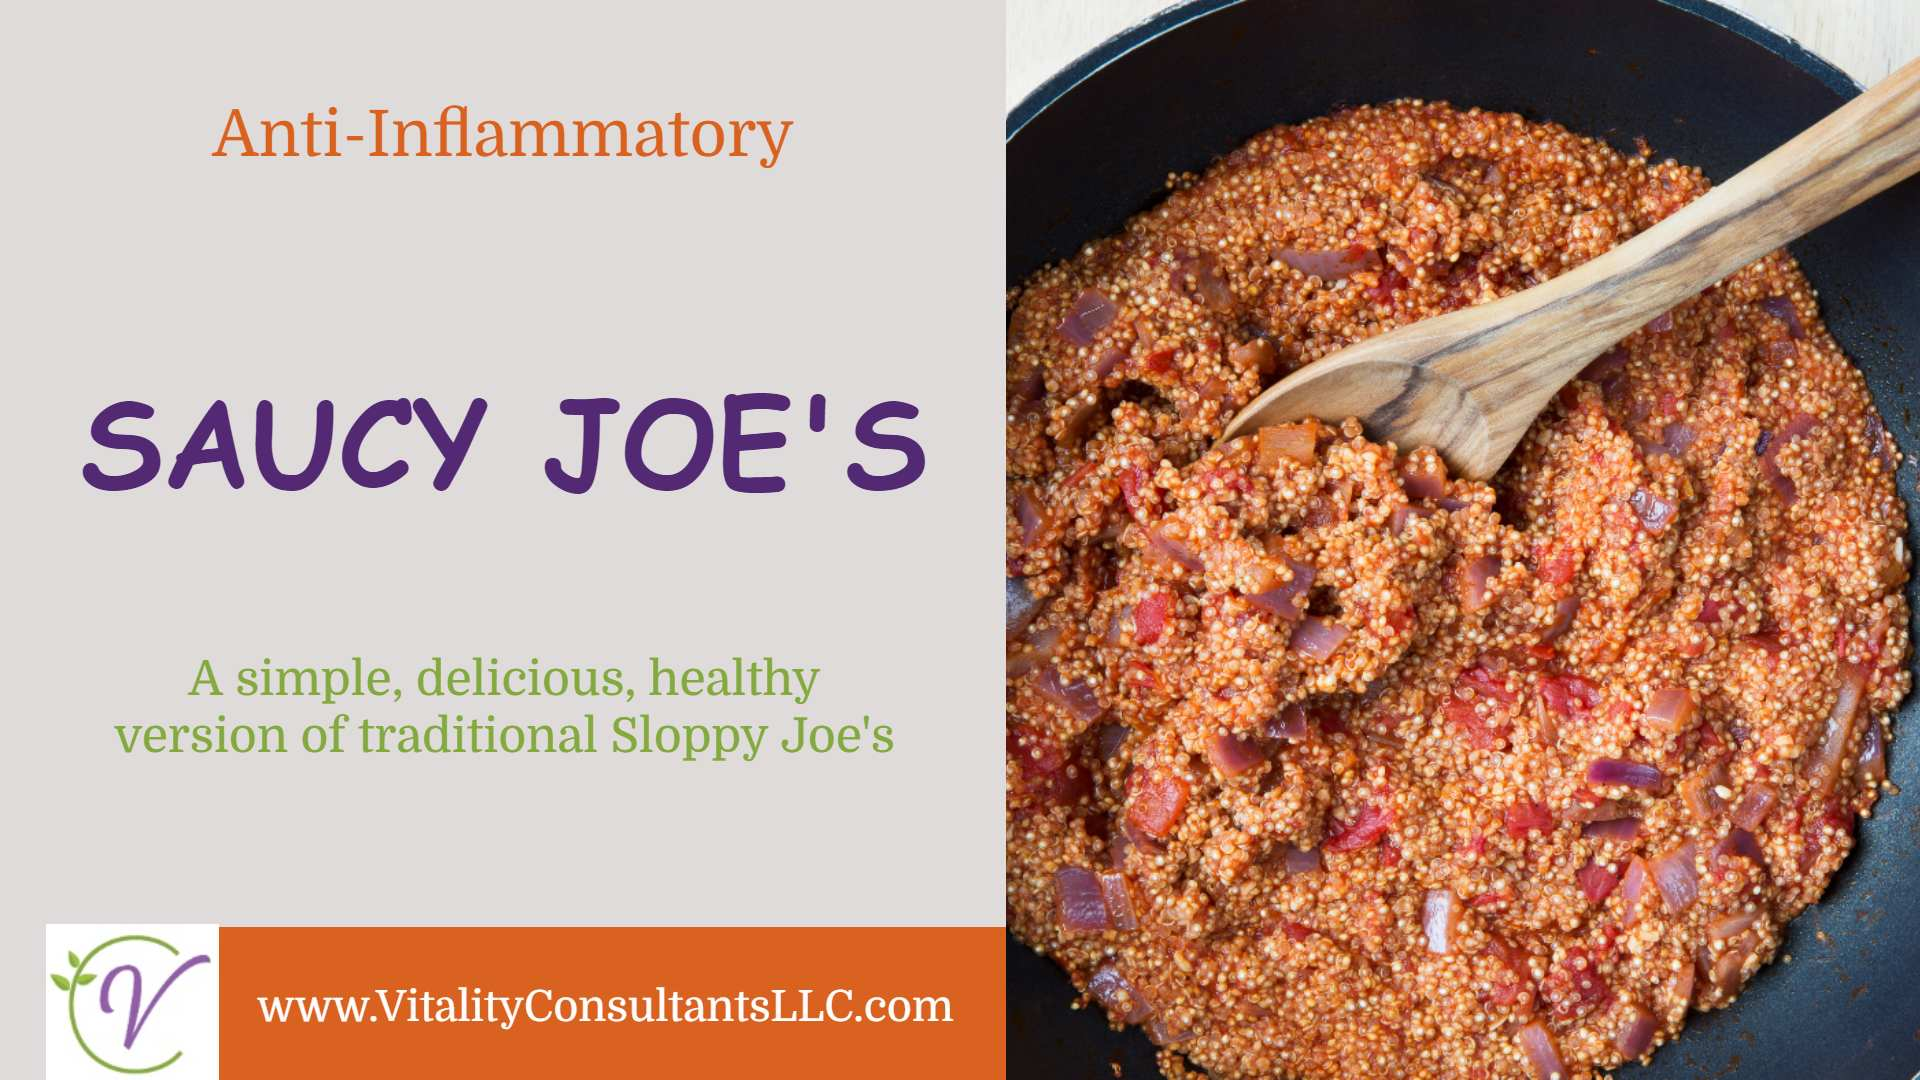 Saucy Joe's